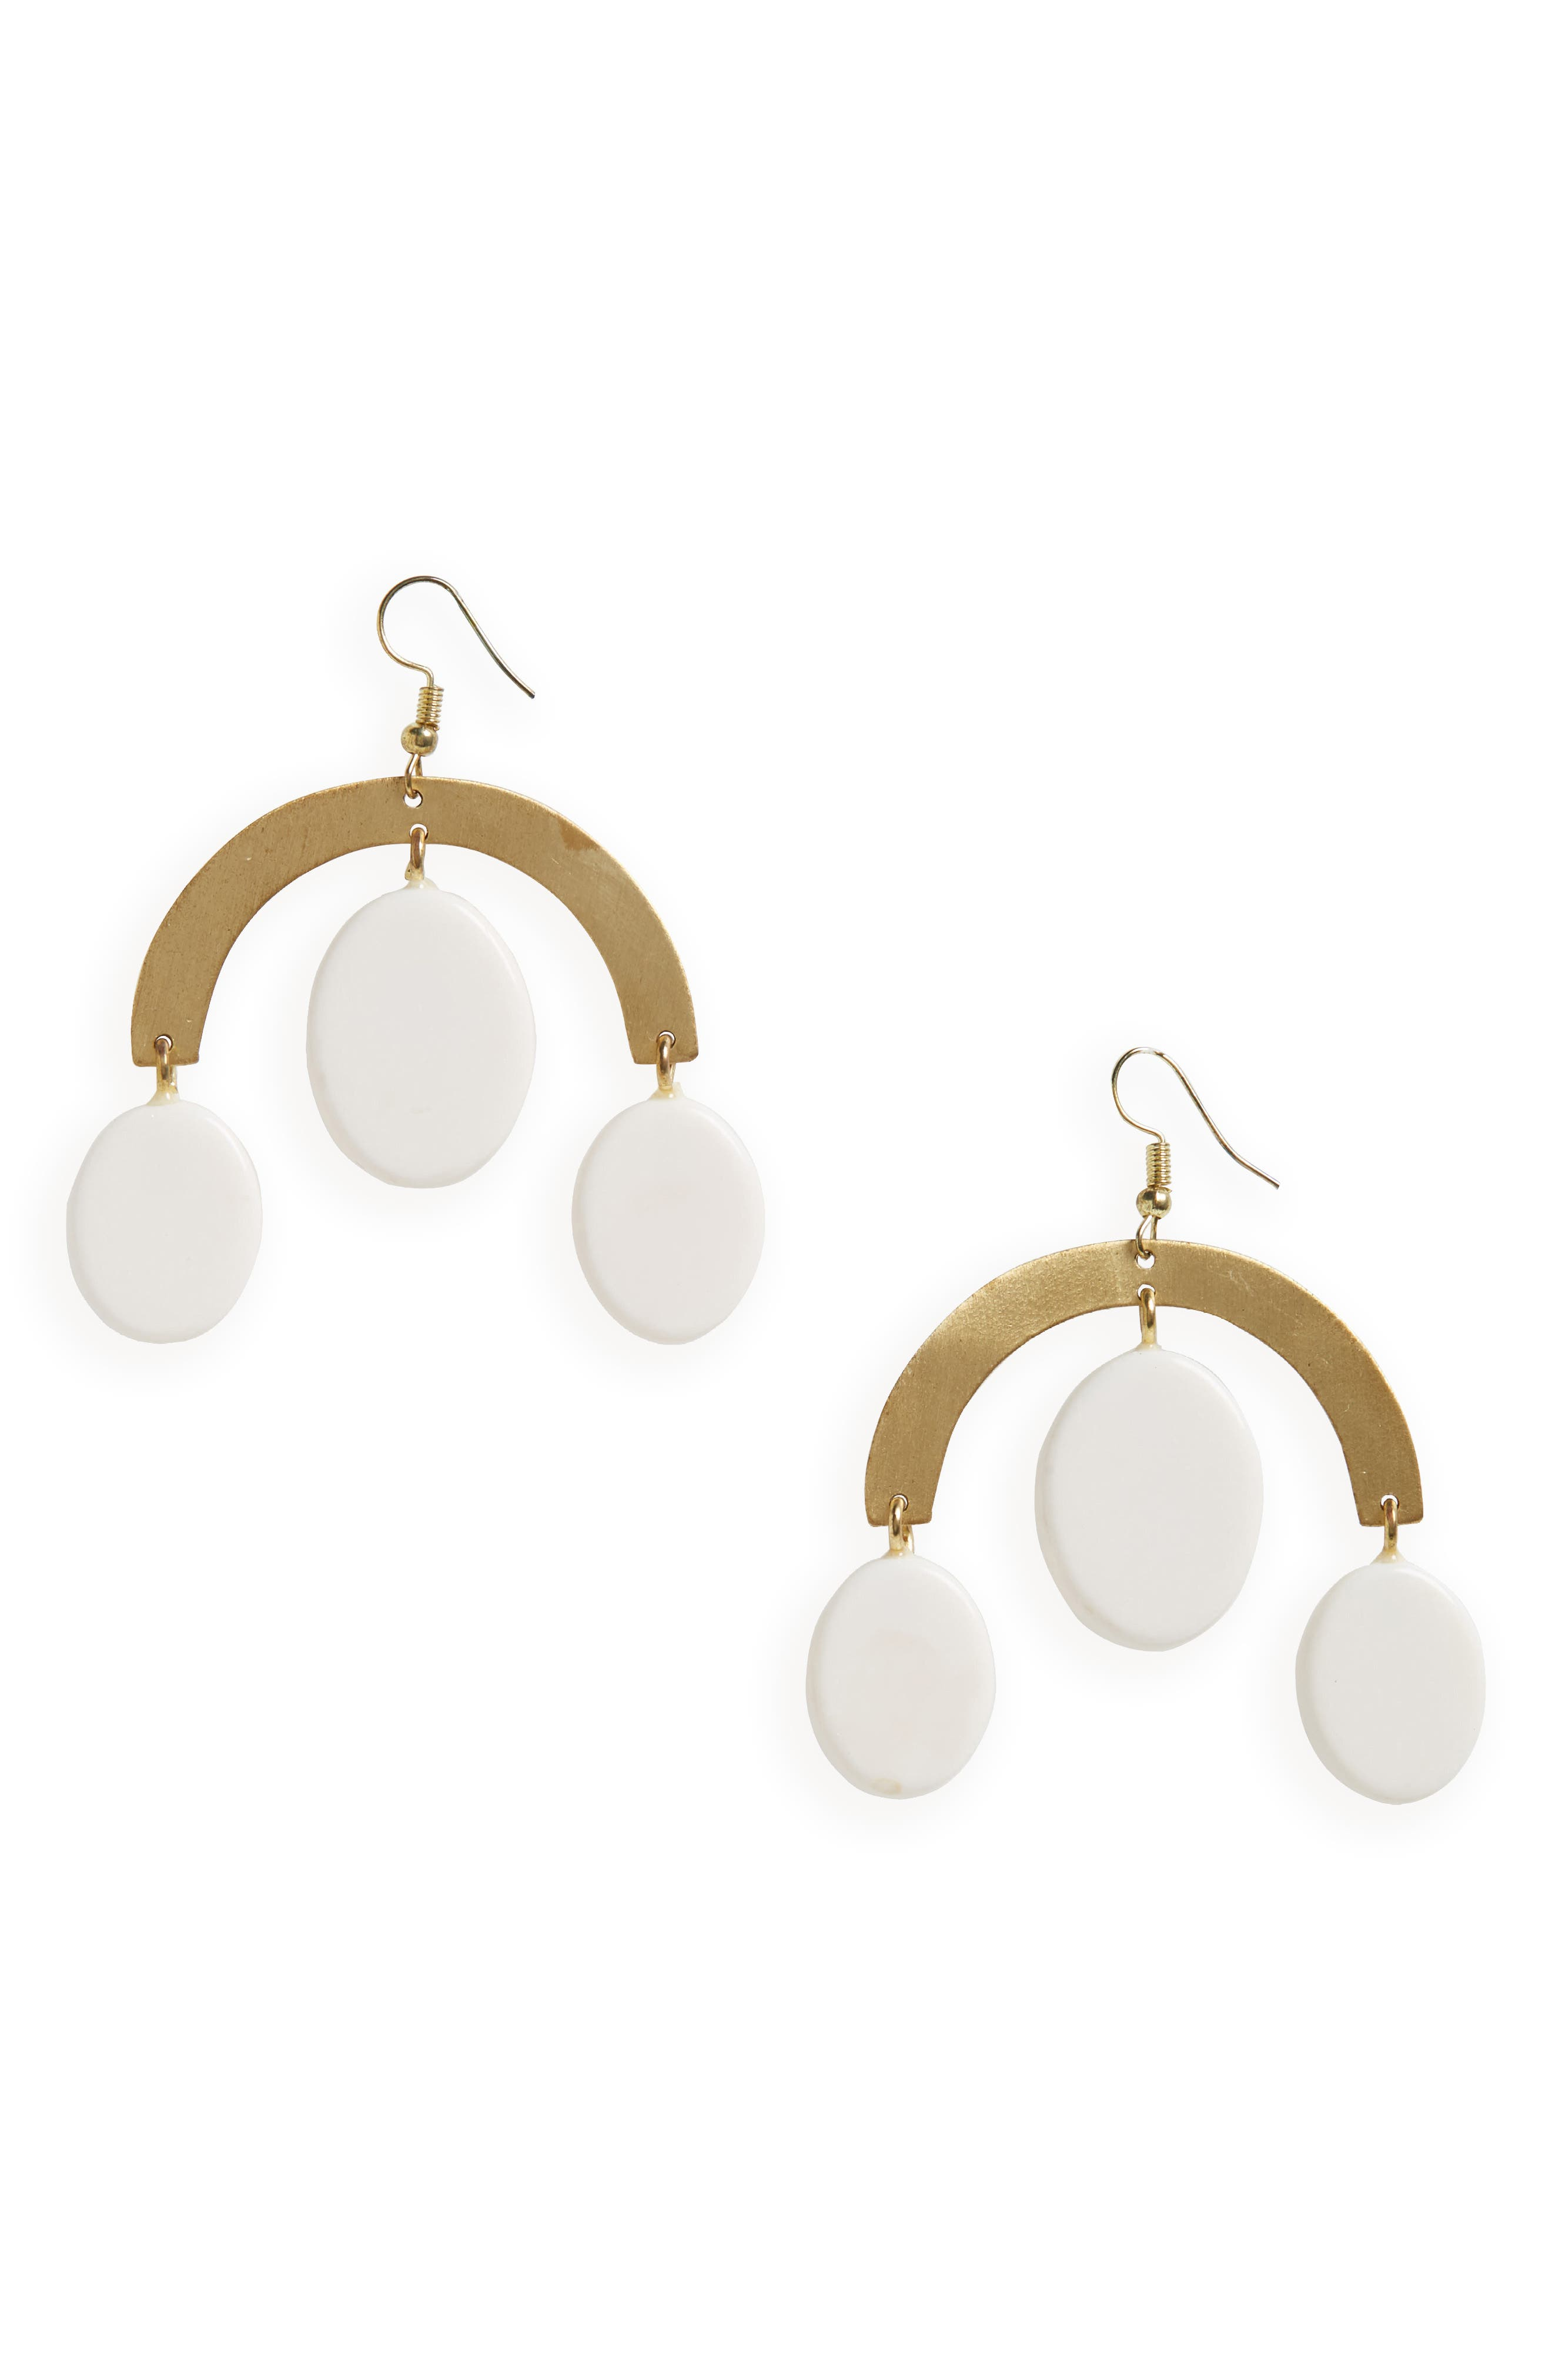 Clove Earrings,                         Main,                         color, WHITE